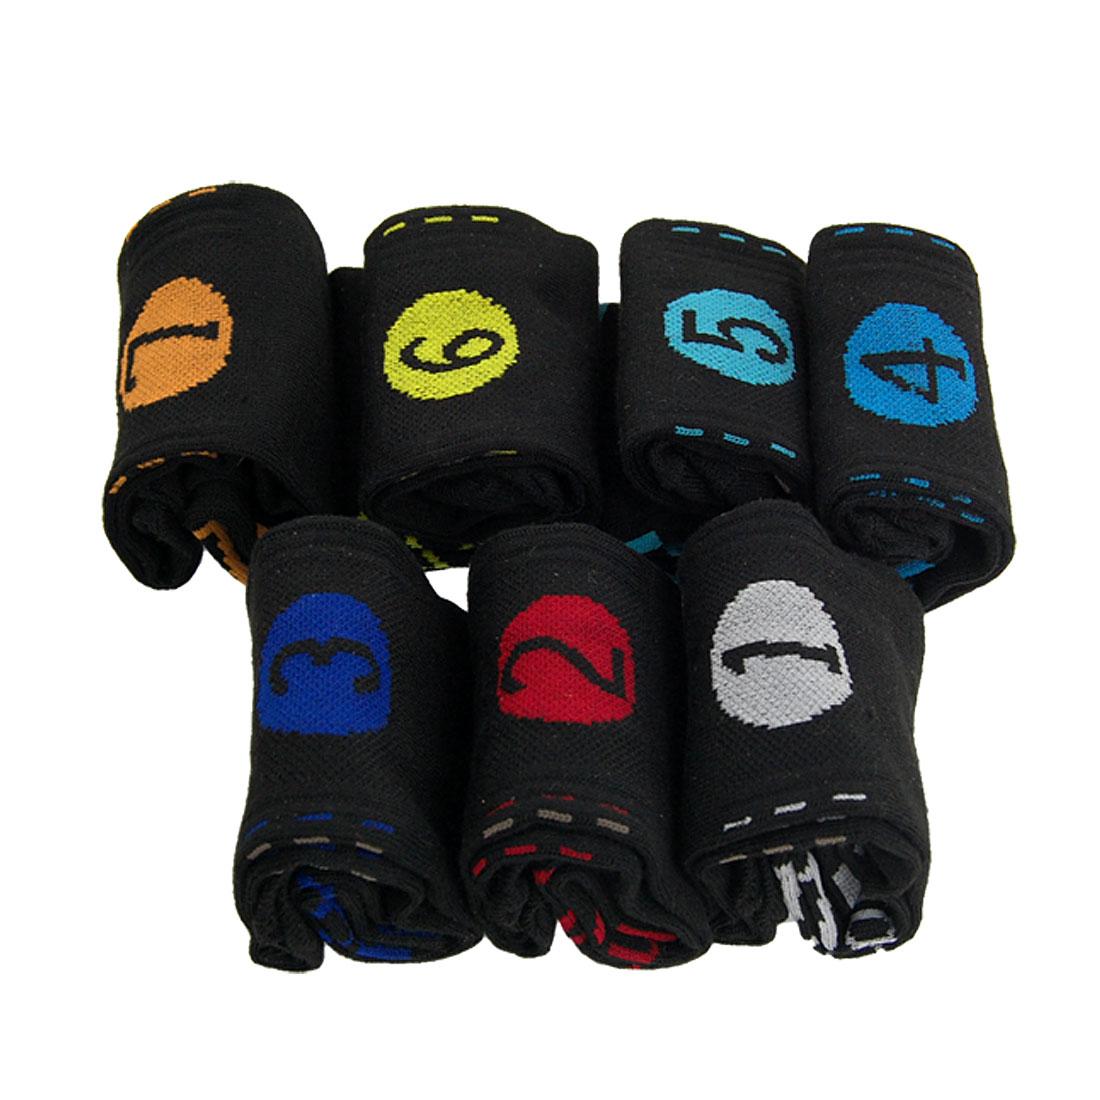 Men 7 Pair Black Ribbing Stretchy Feet Stockings Week Socks